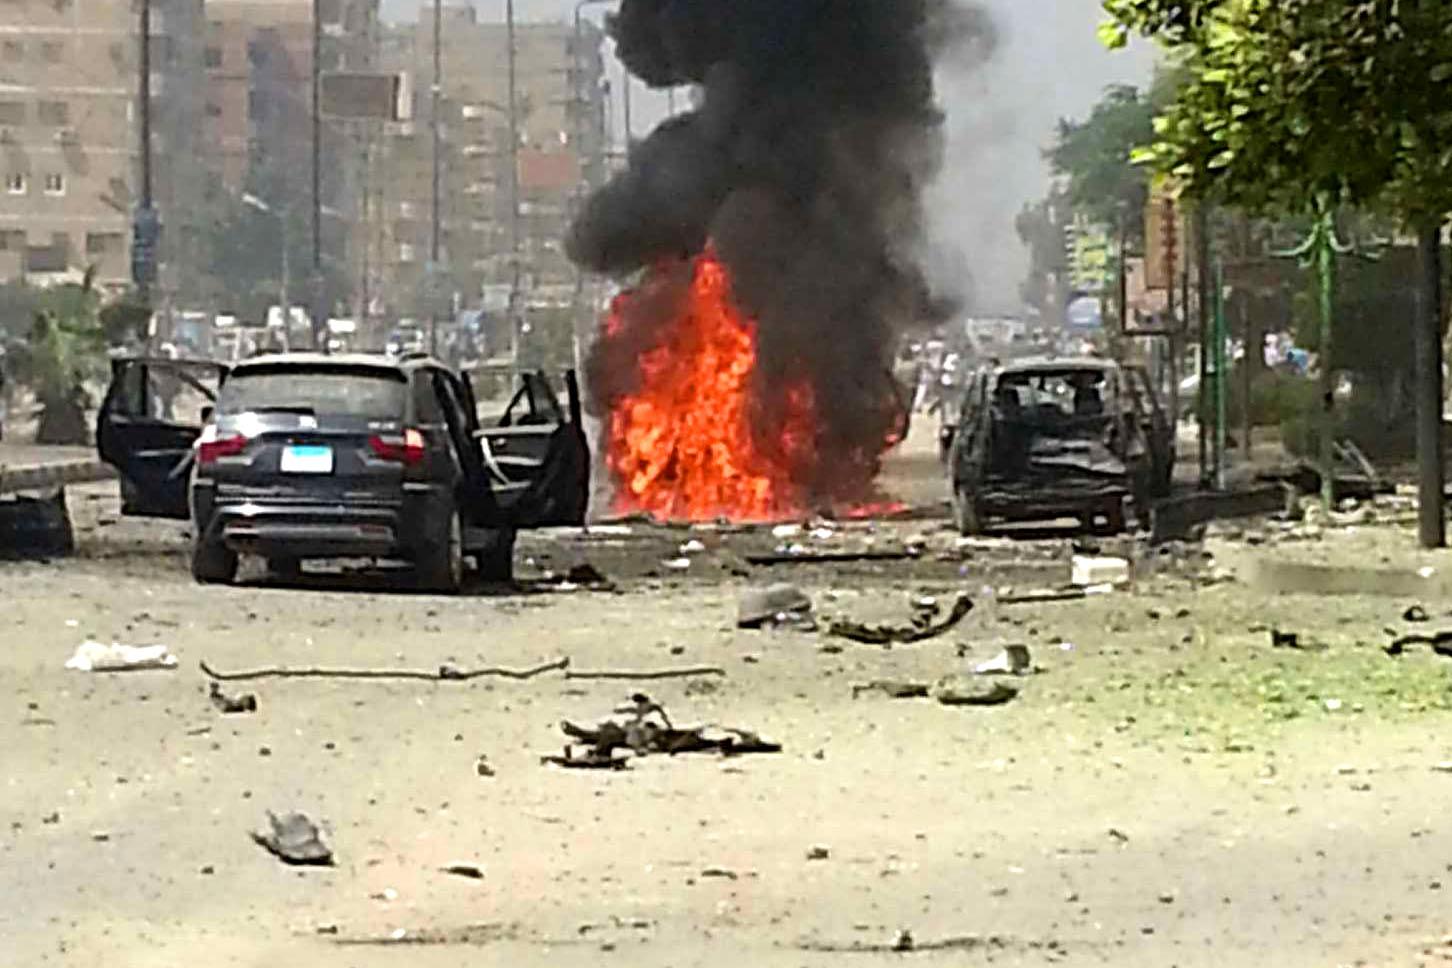 Egypt Passes Anti-Terror Law